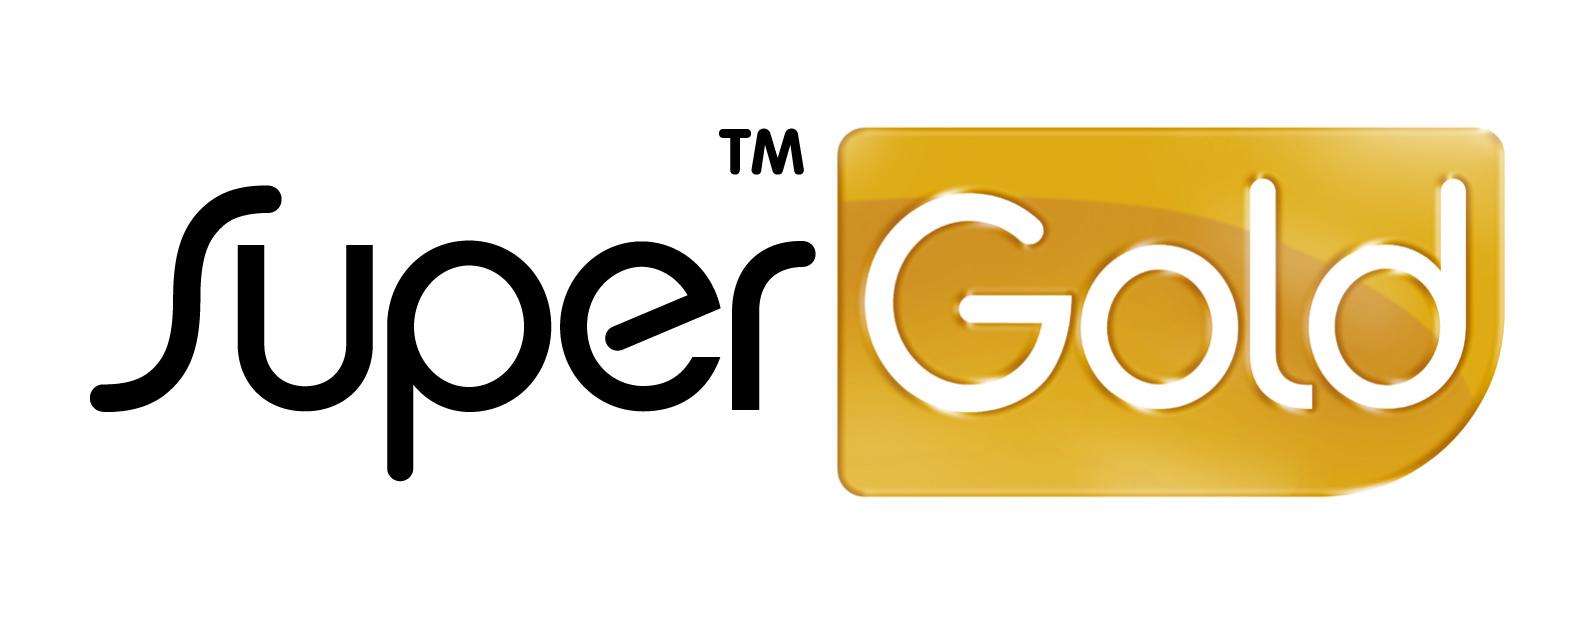 SG_logo_POS_CMYK_HR.JPG